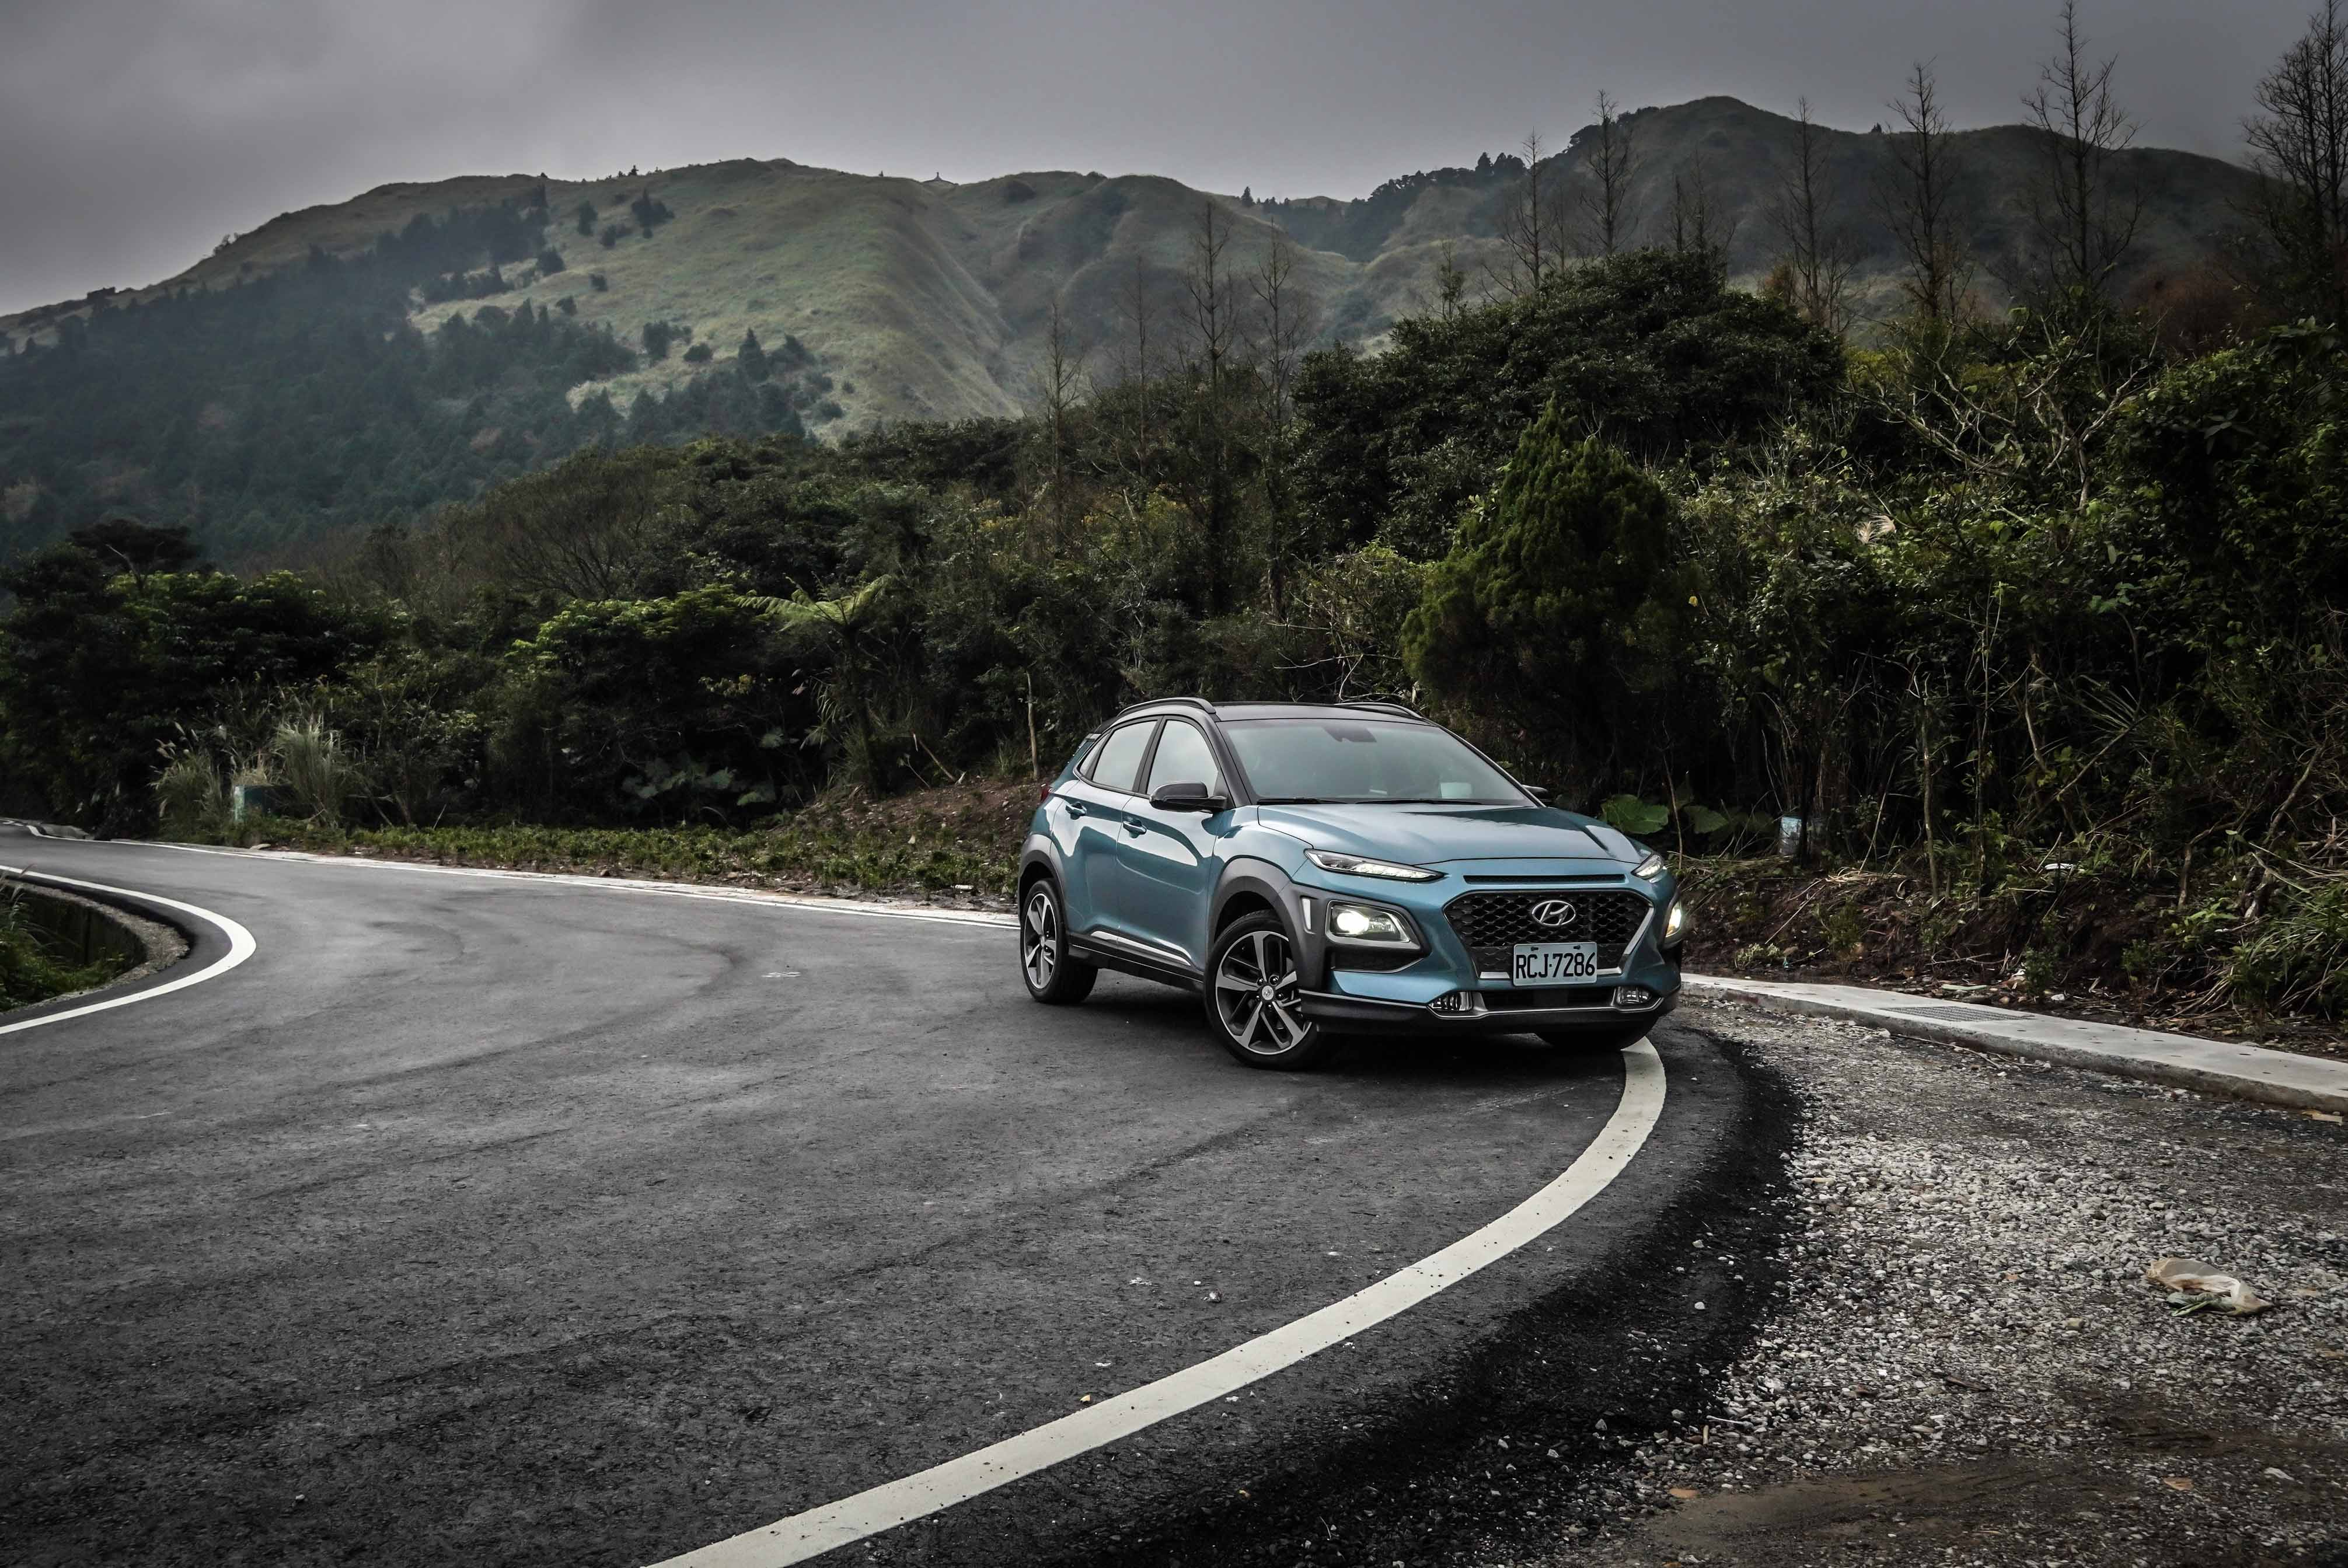 Hyundai Kona 分四車型販售,1.6T 勁動、勁智、勁化、4WD 極致型,售價分別為 79.9 萬、88.9 萬、92.9 萬、98.9 萬。